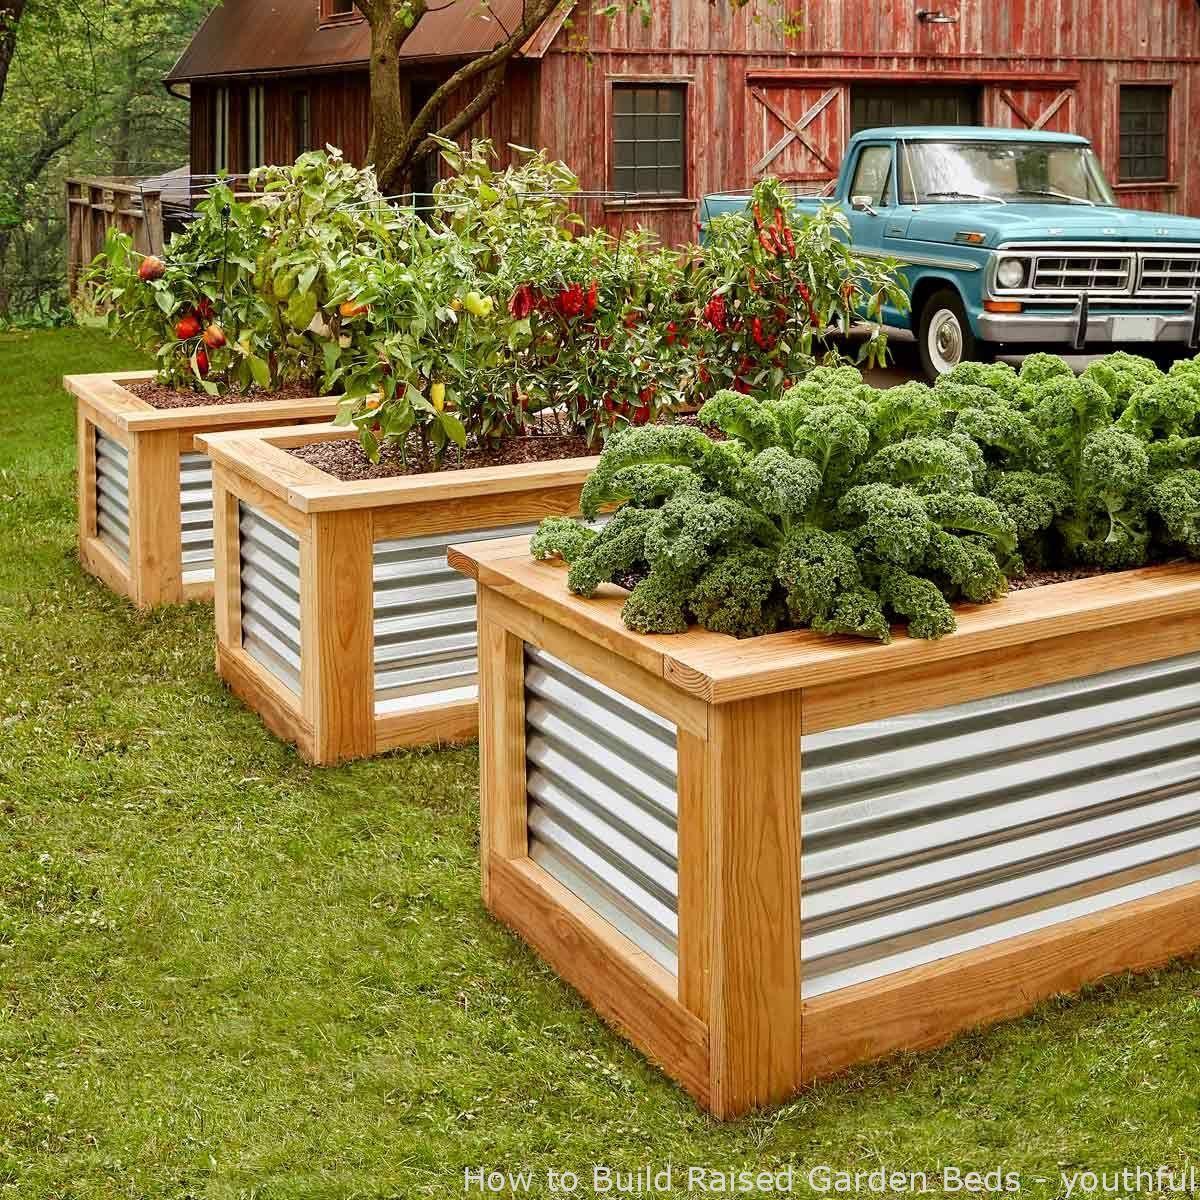 Gardening How To Build Raised Garden Beds Youthful Bedgardenideas Dyiraisedgardenb In 2020 Erhohte Gartenbeet Pergola Bauen Erhohte Beete